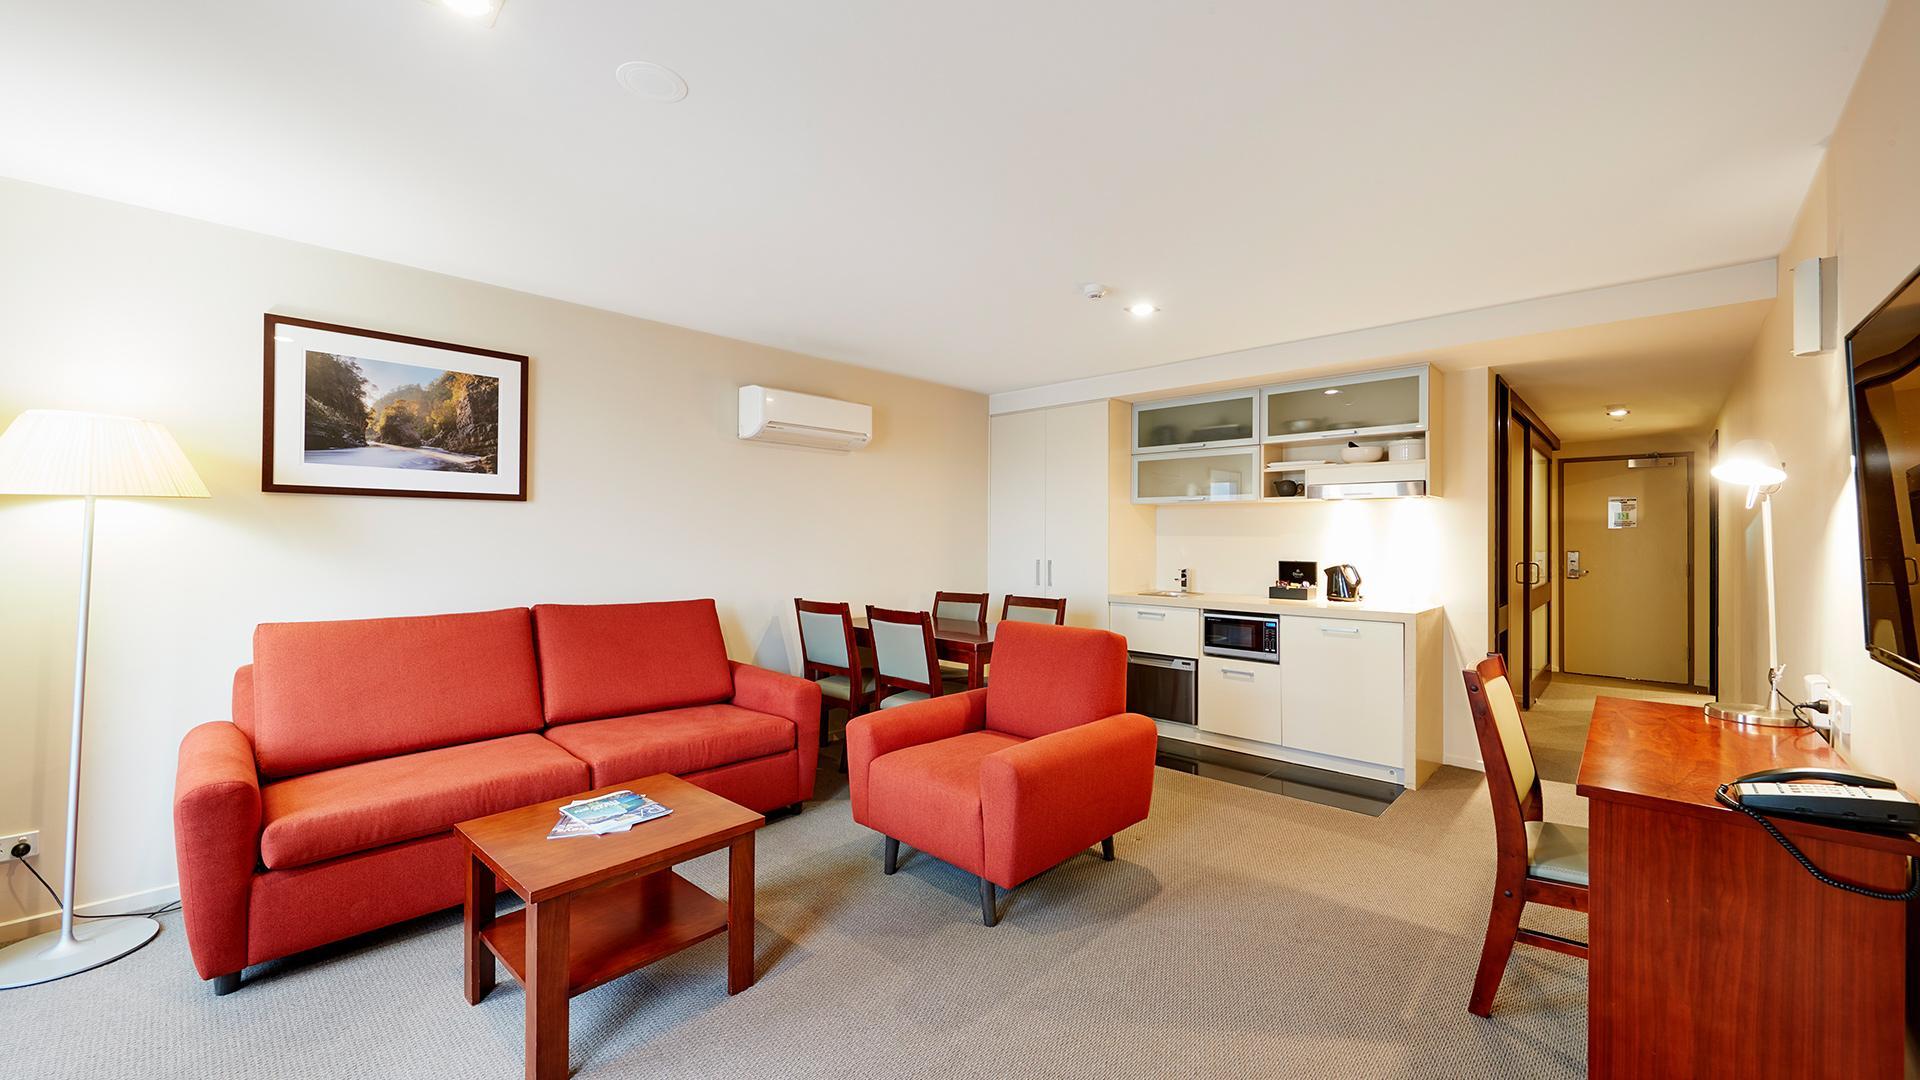 Family Room  image 1 at RACV Hobart Hotel by Hobart City Council, Tasmania, Australia